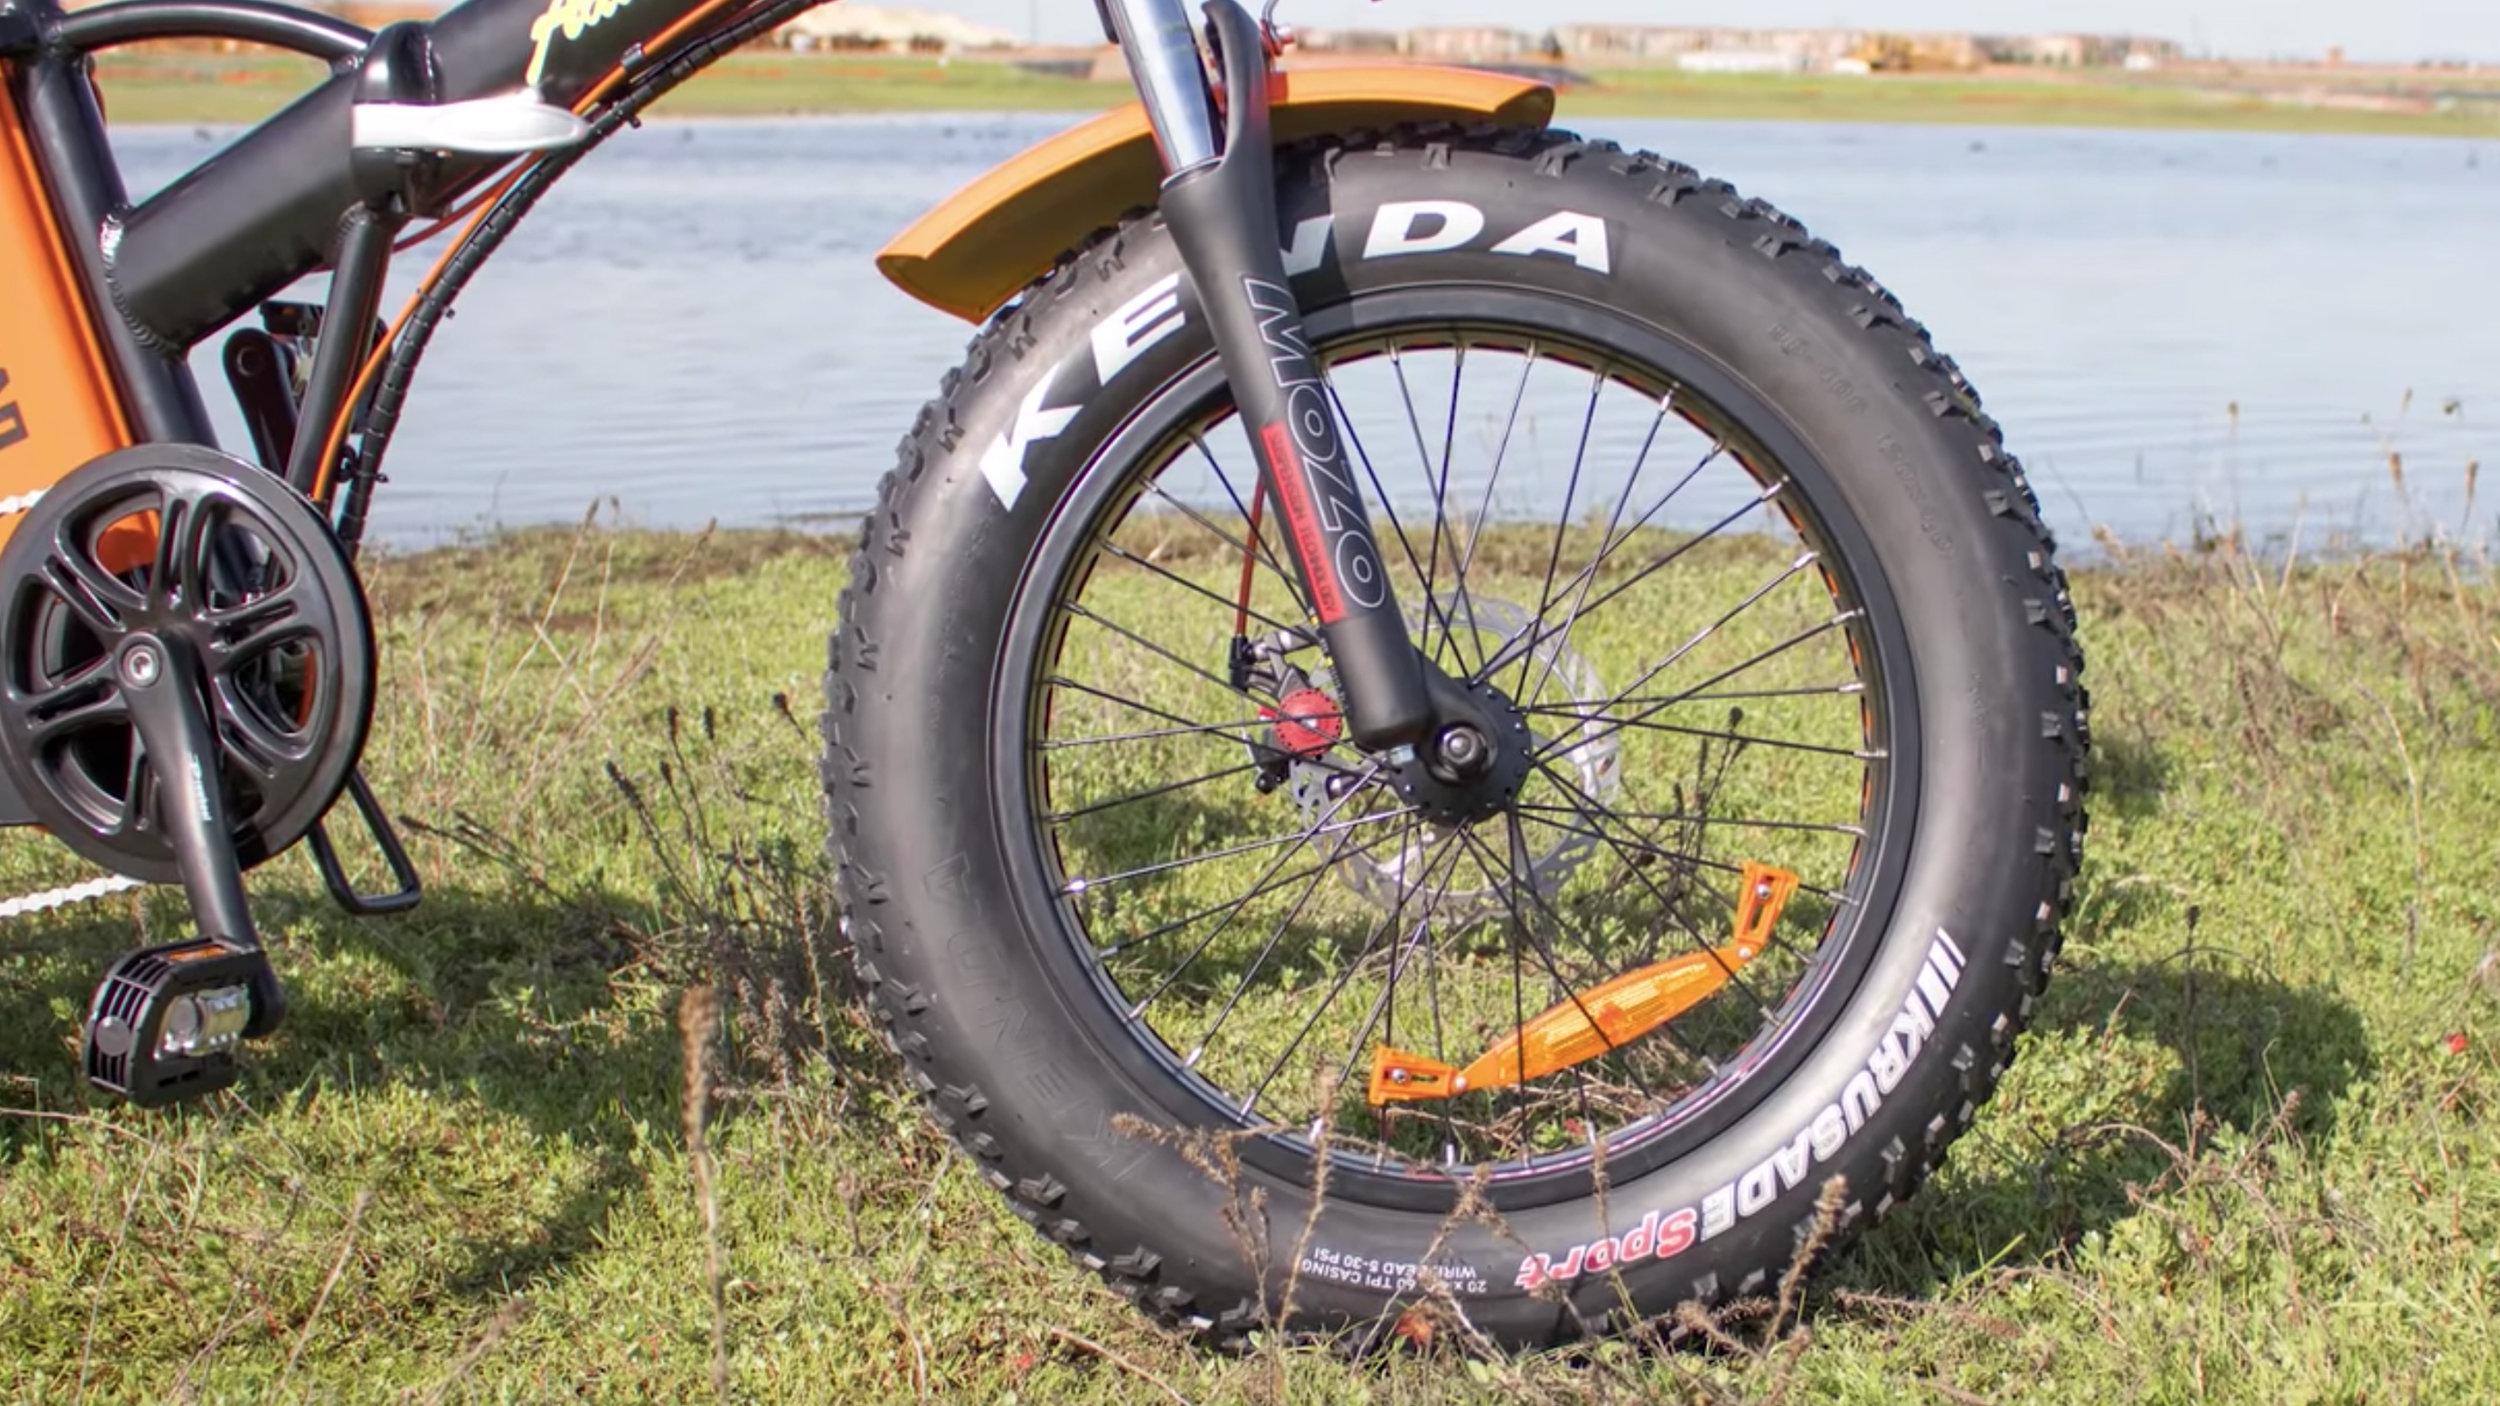 electrified-reviews-addmotor-motan-m150p7-electric-bike-review-front-wheel.jpg